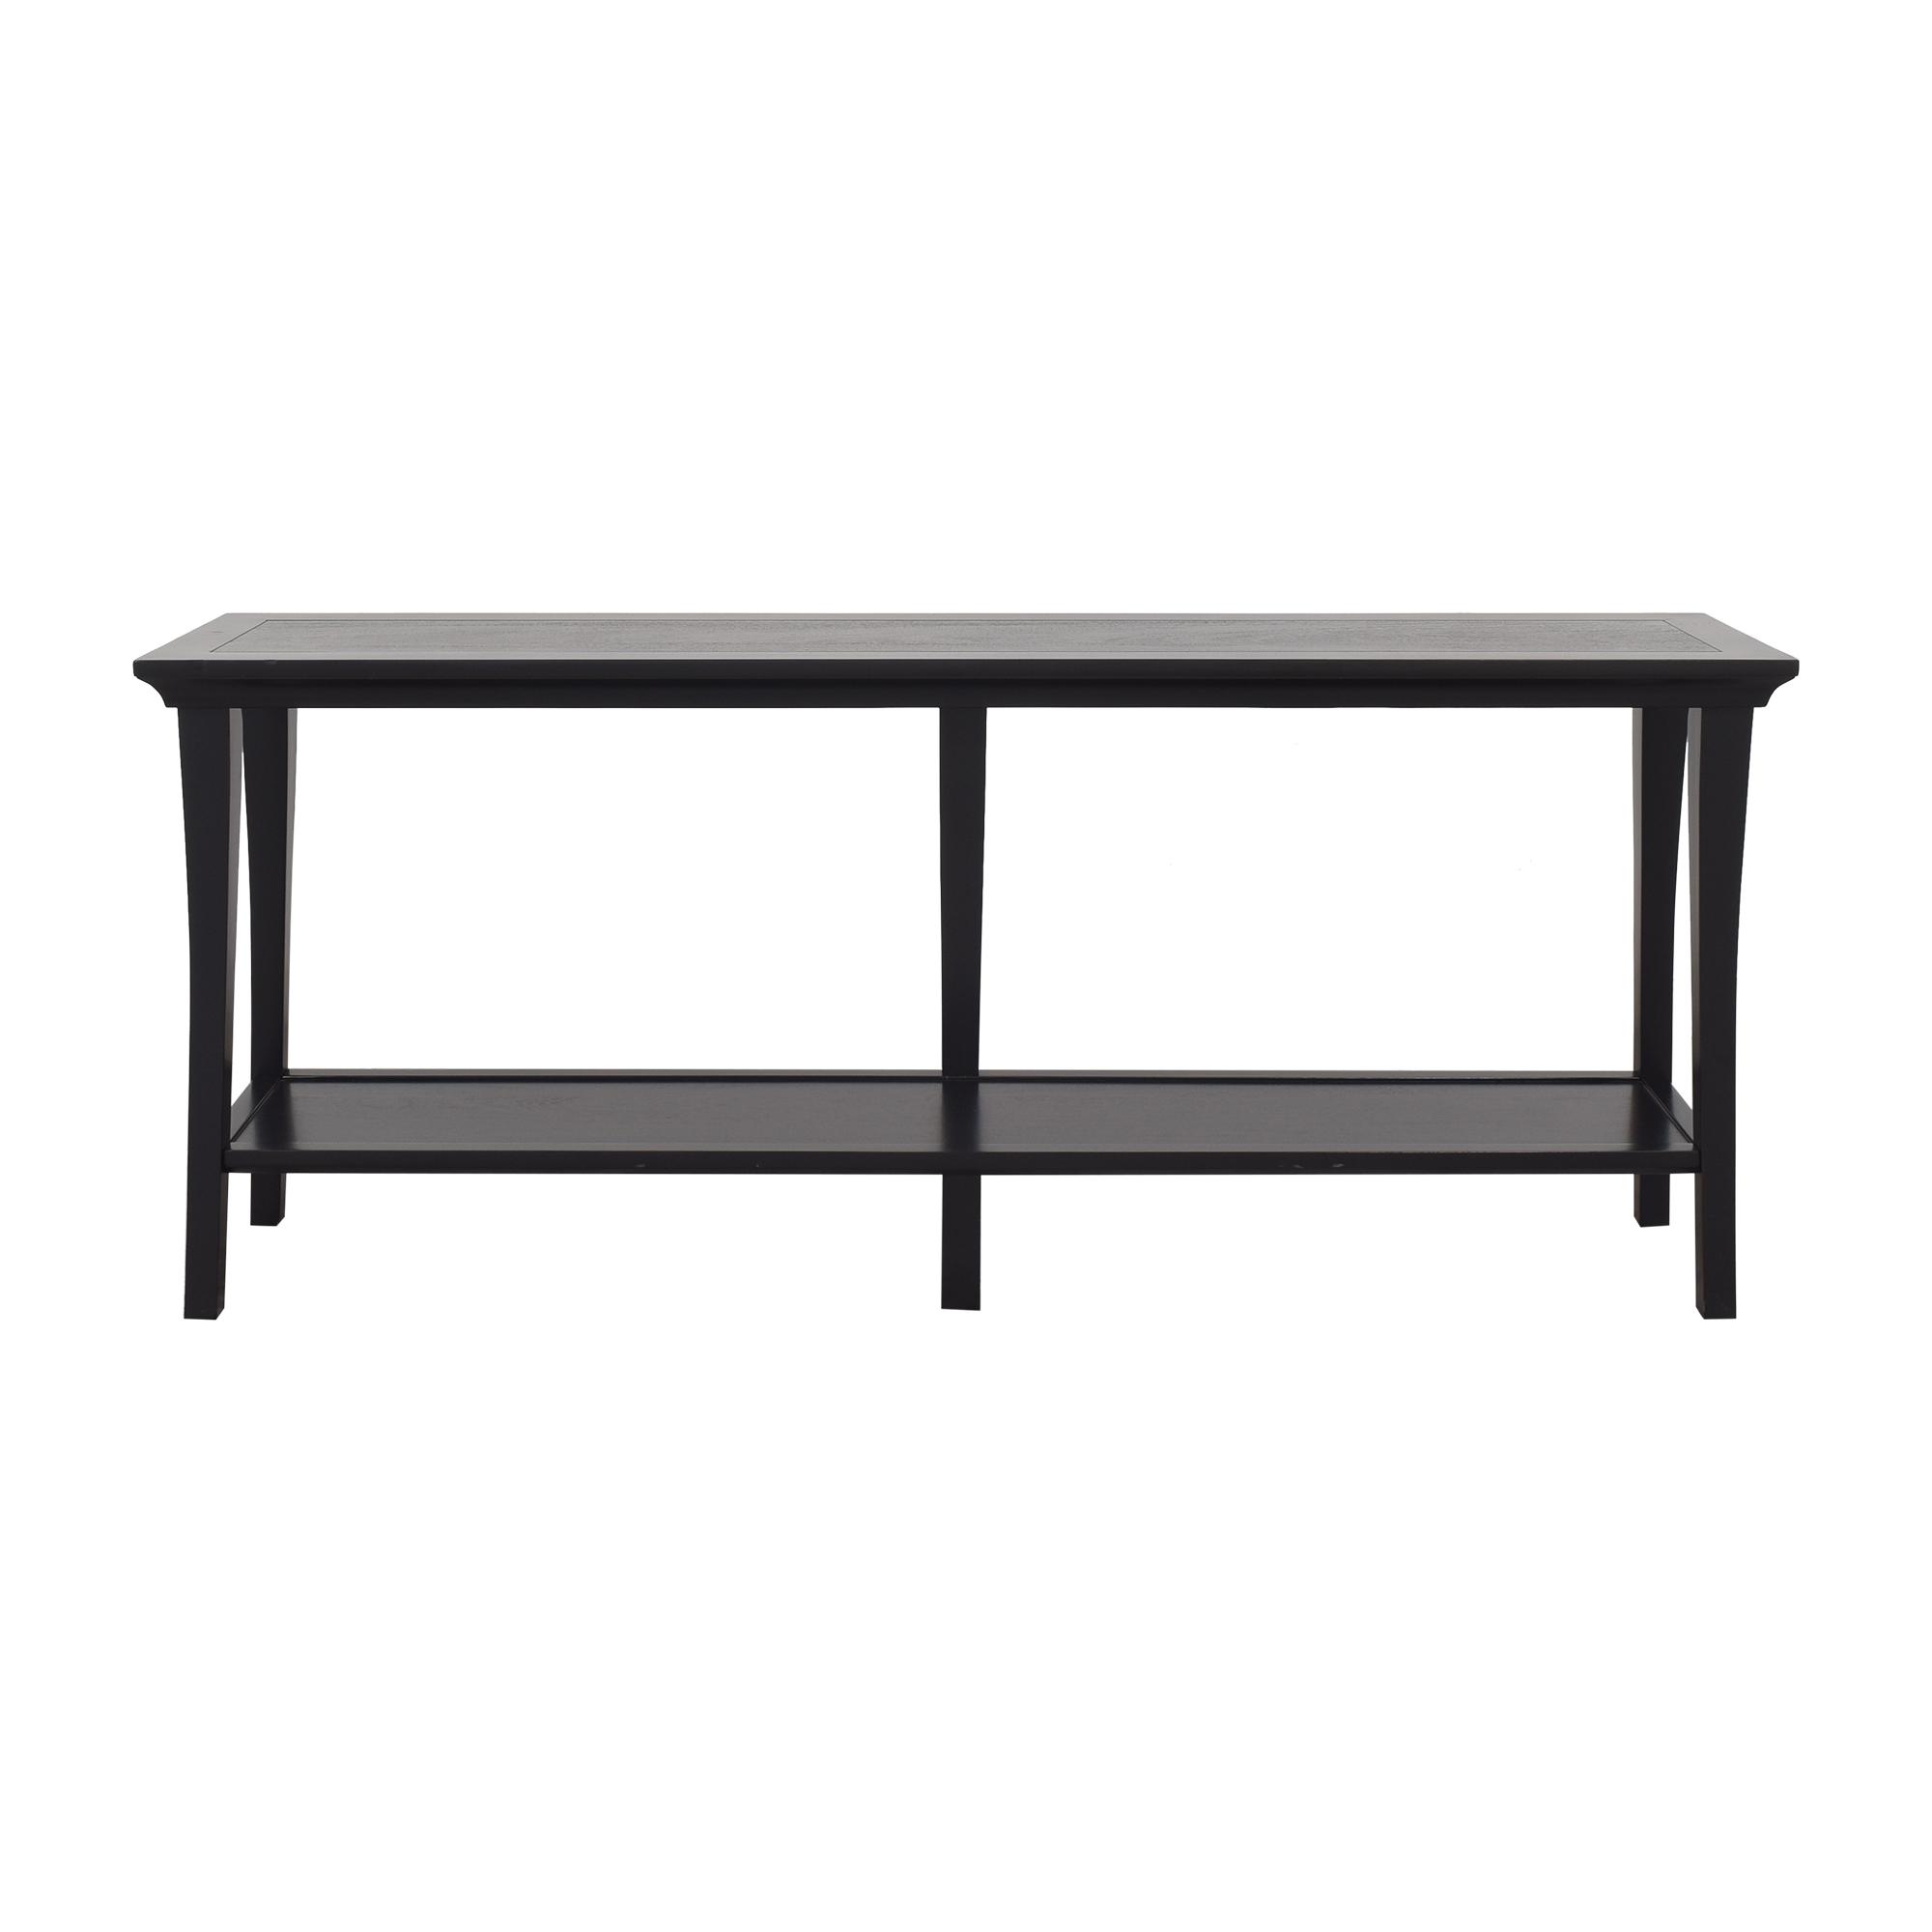 buy Crate & Barrel Console Table Crate & Barrel Tables